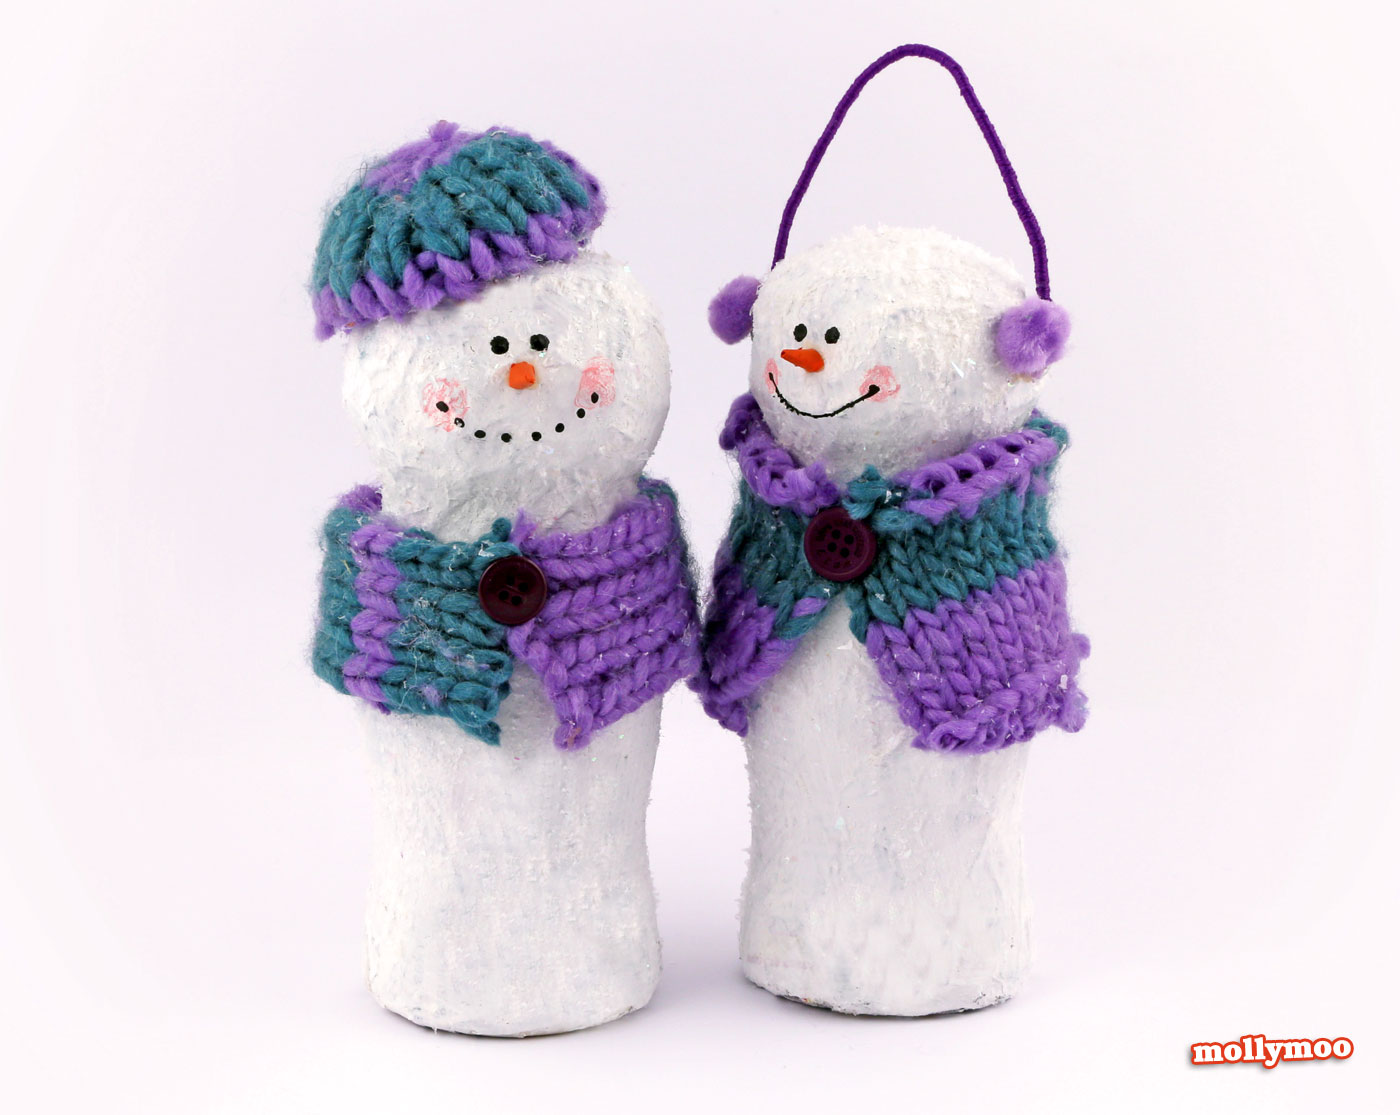 Molly Moo Crafts - Papier Mache Snowman